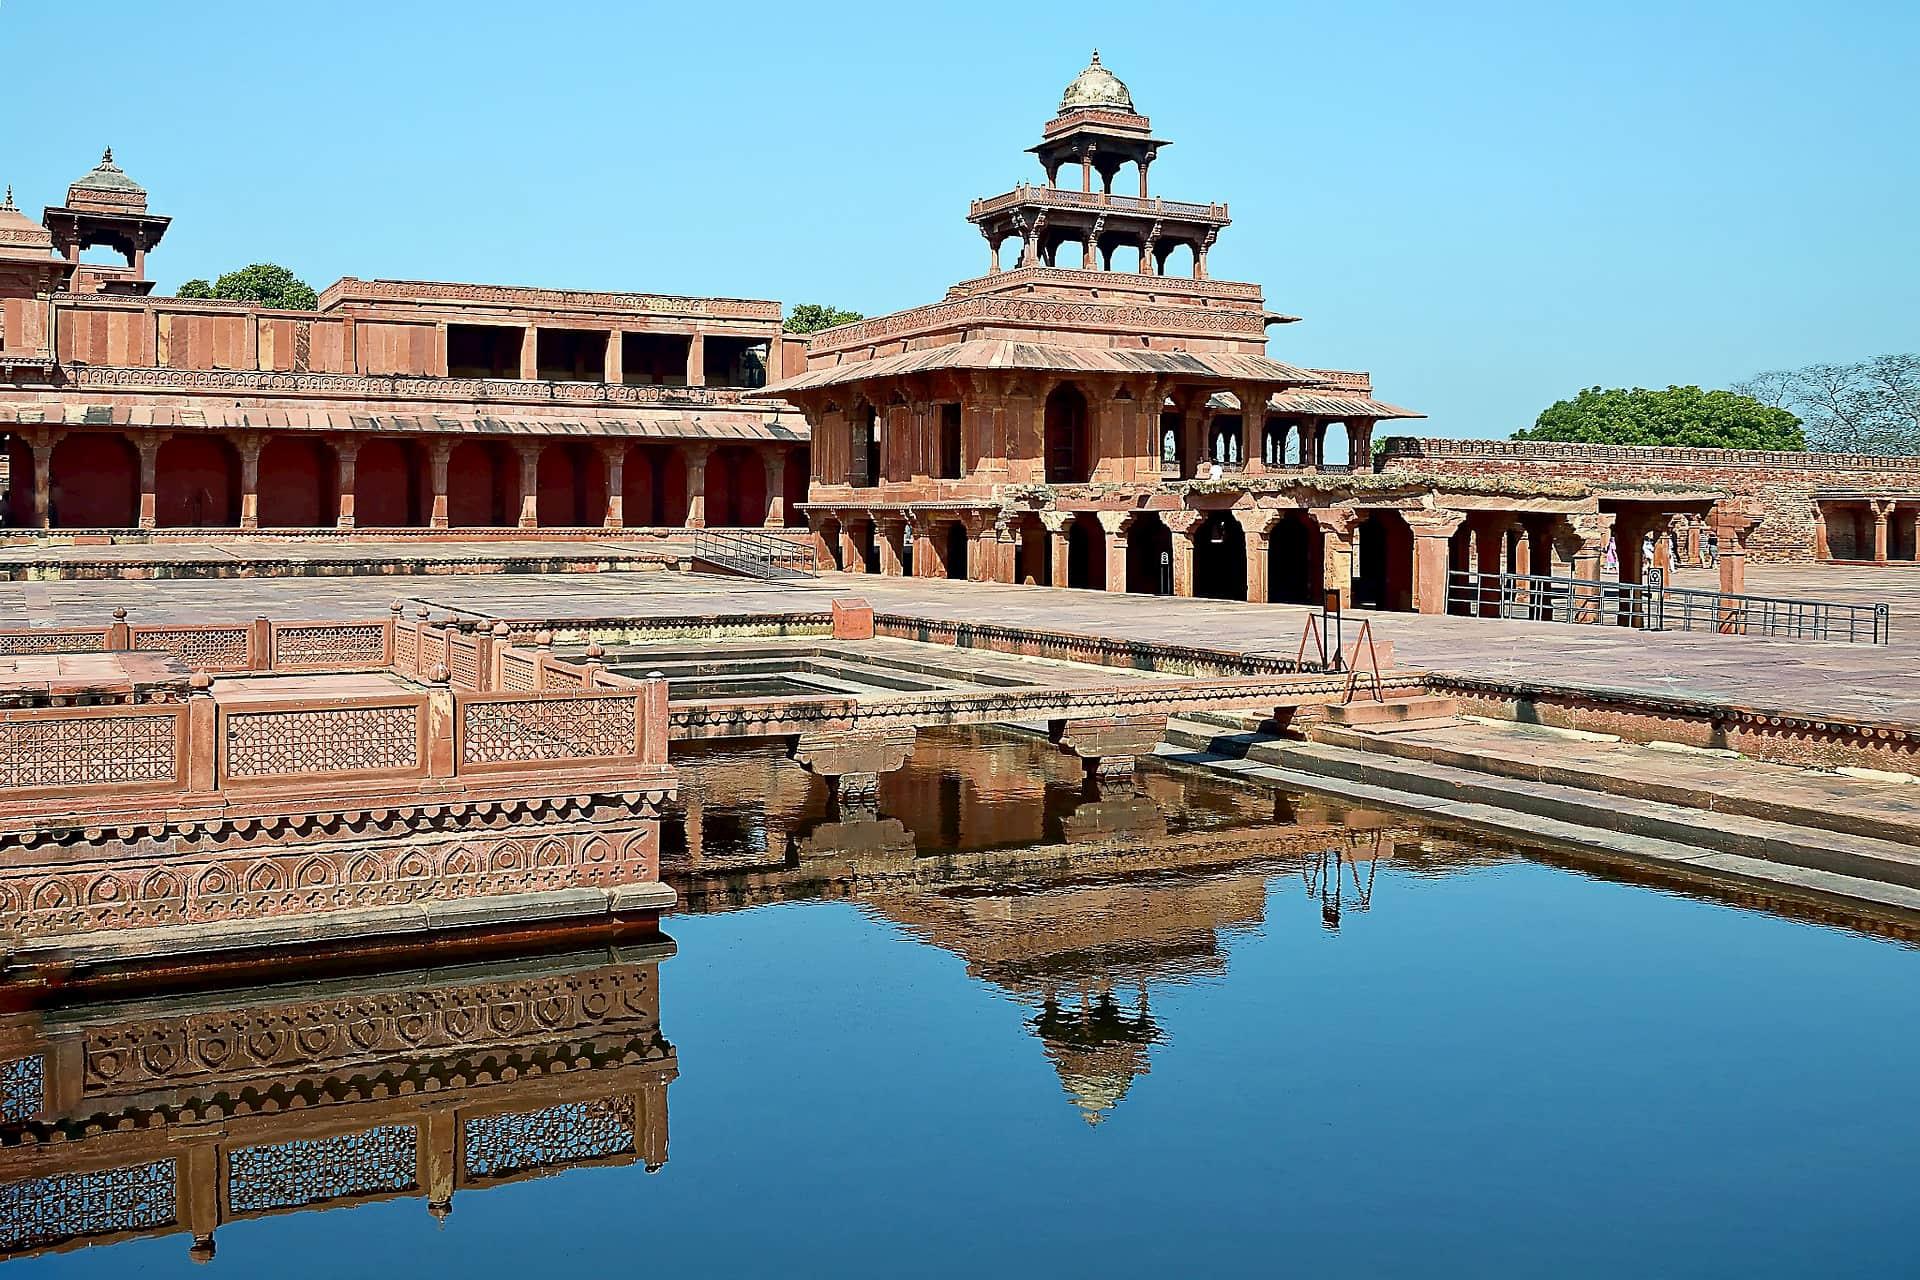 Adventour - India - fatehpur sikri